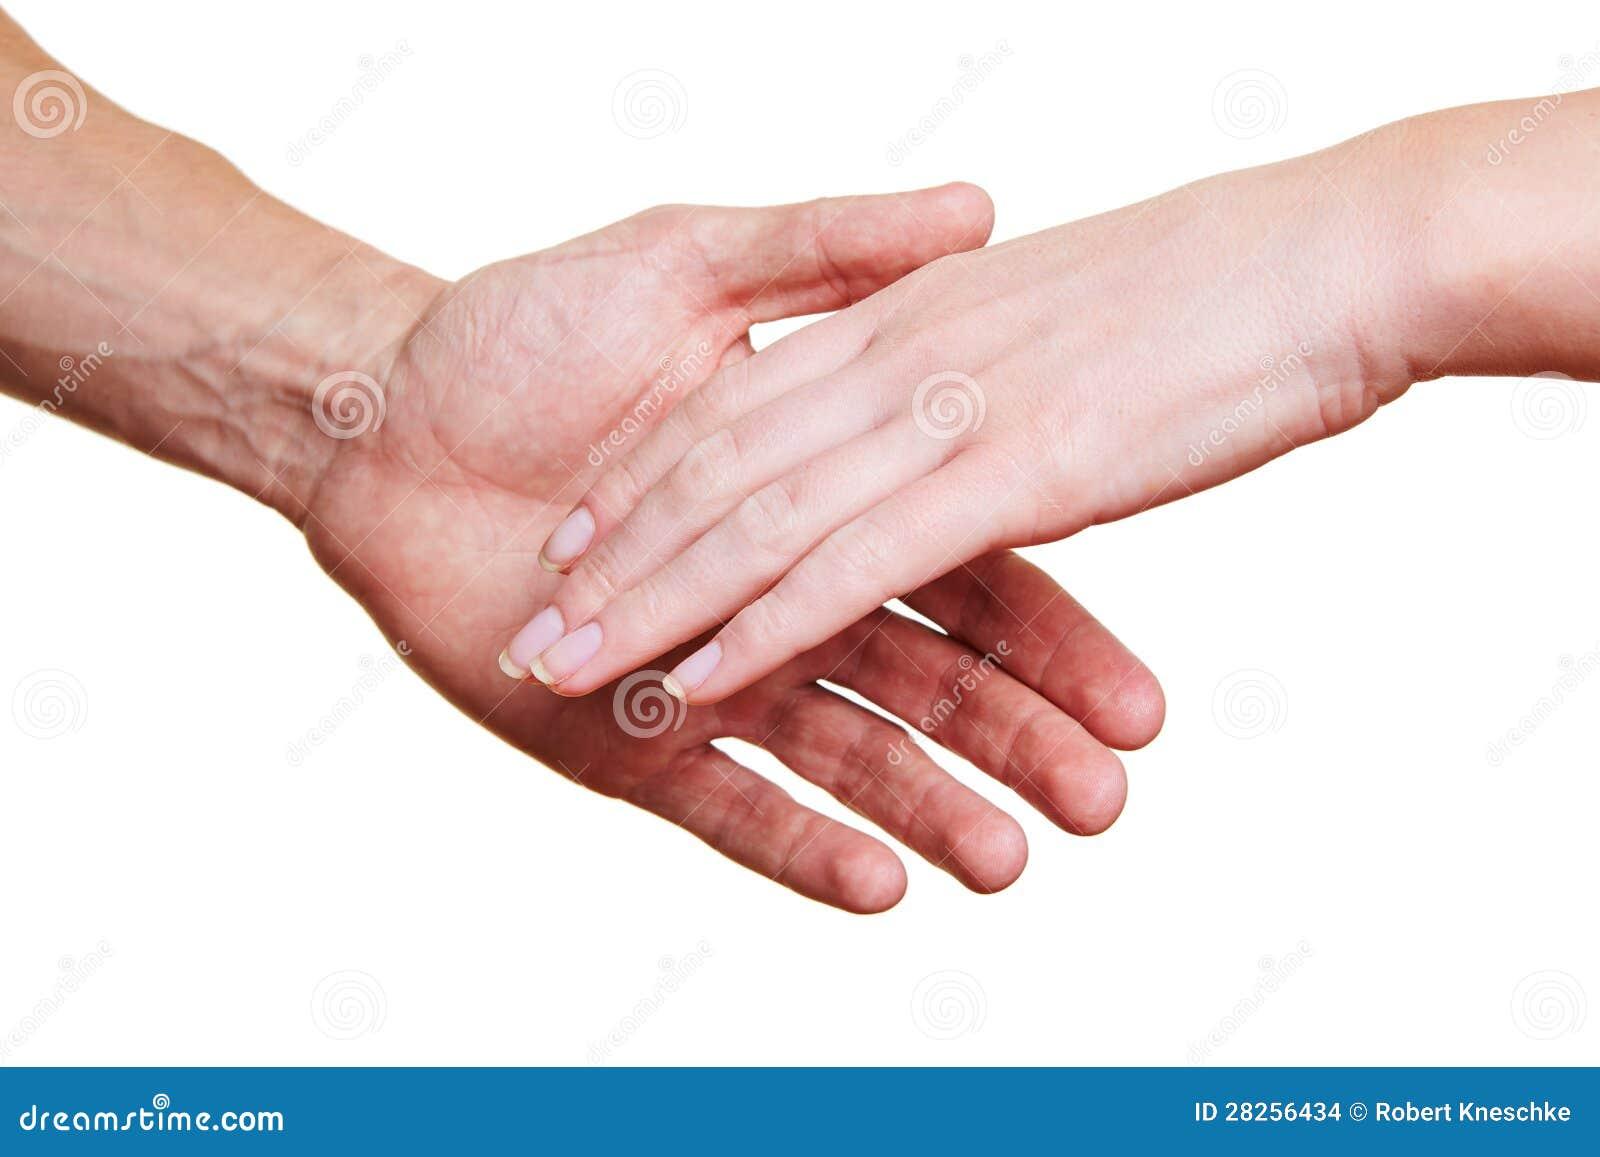 List of gestures